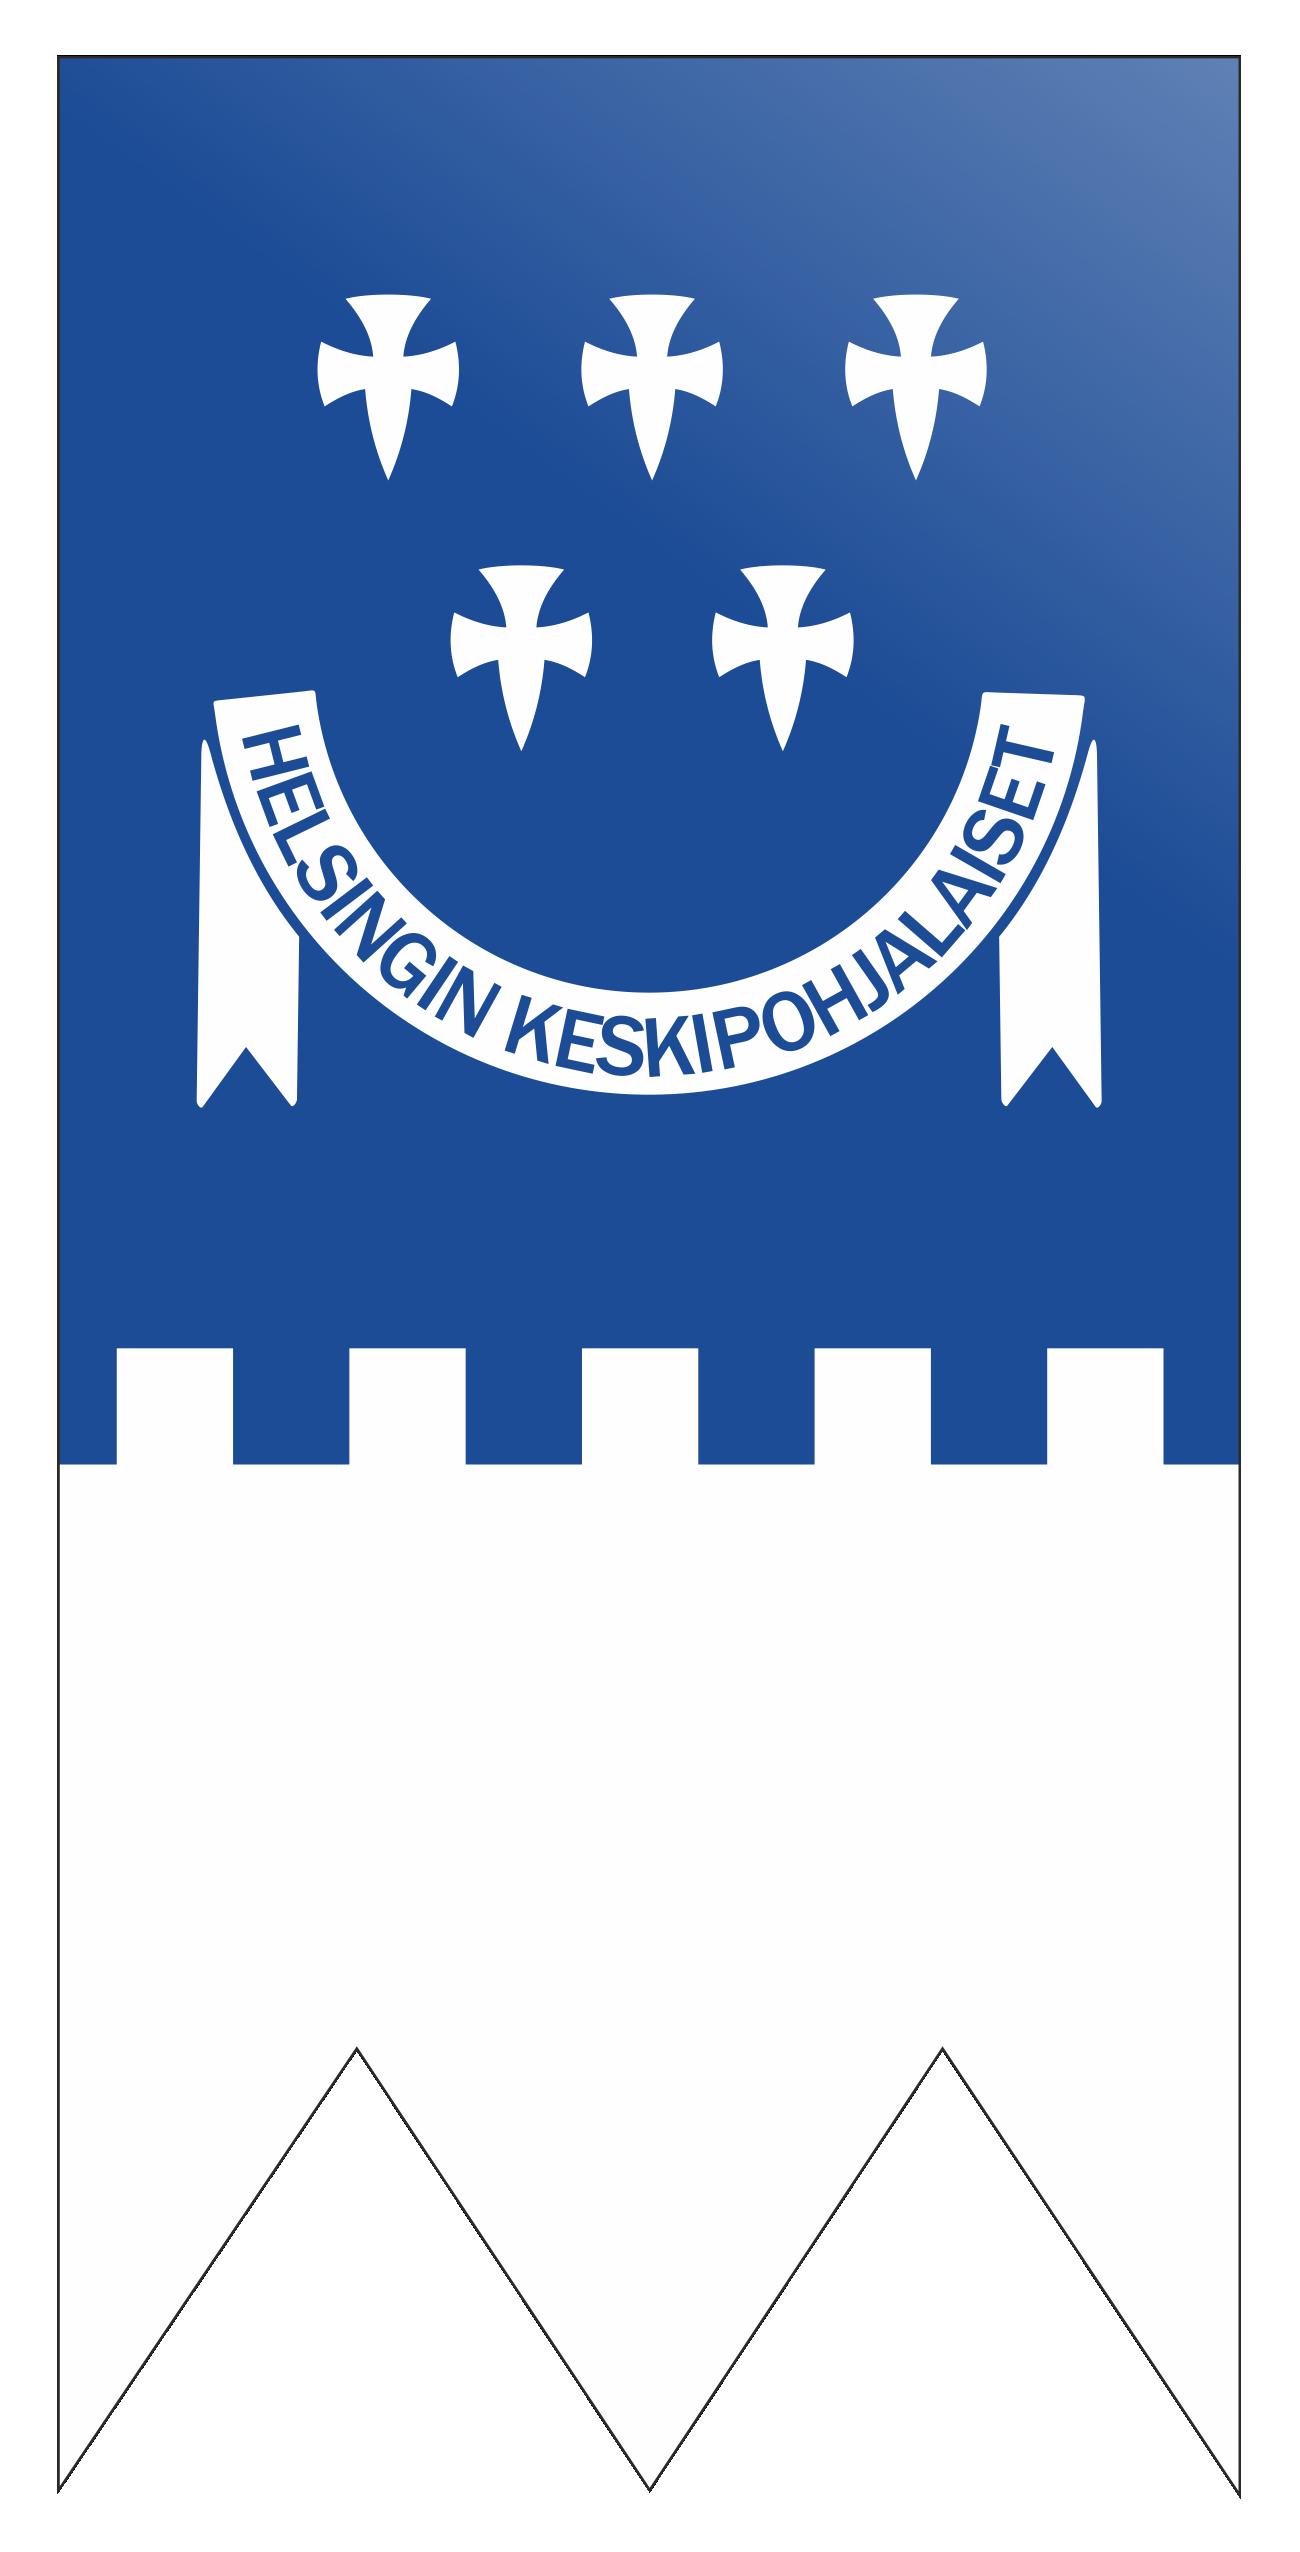 Helsingin Keskipohjalaiset